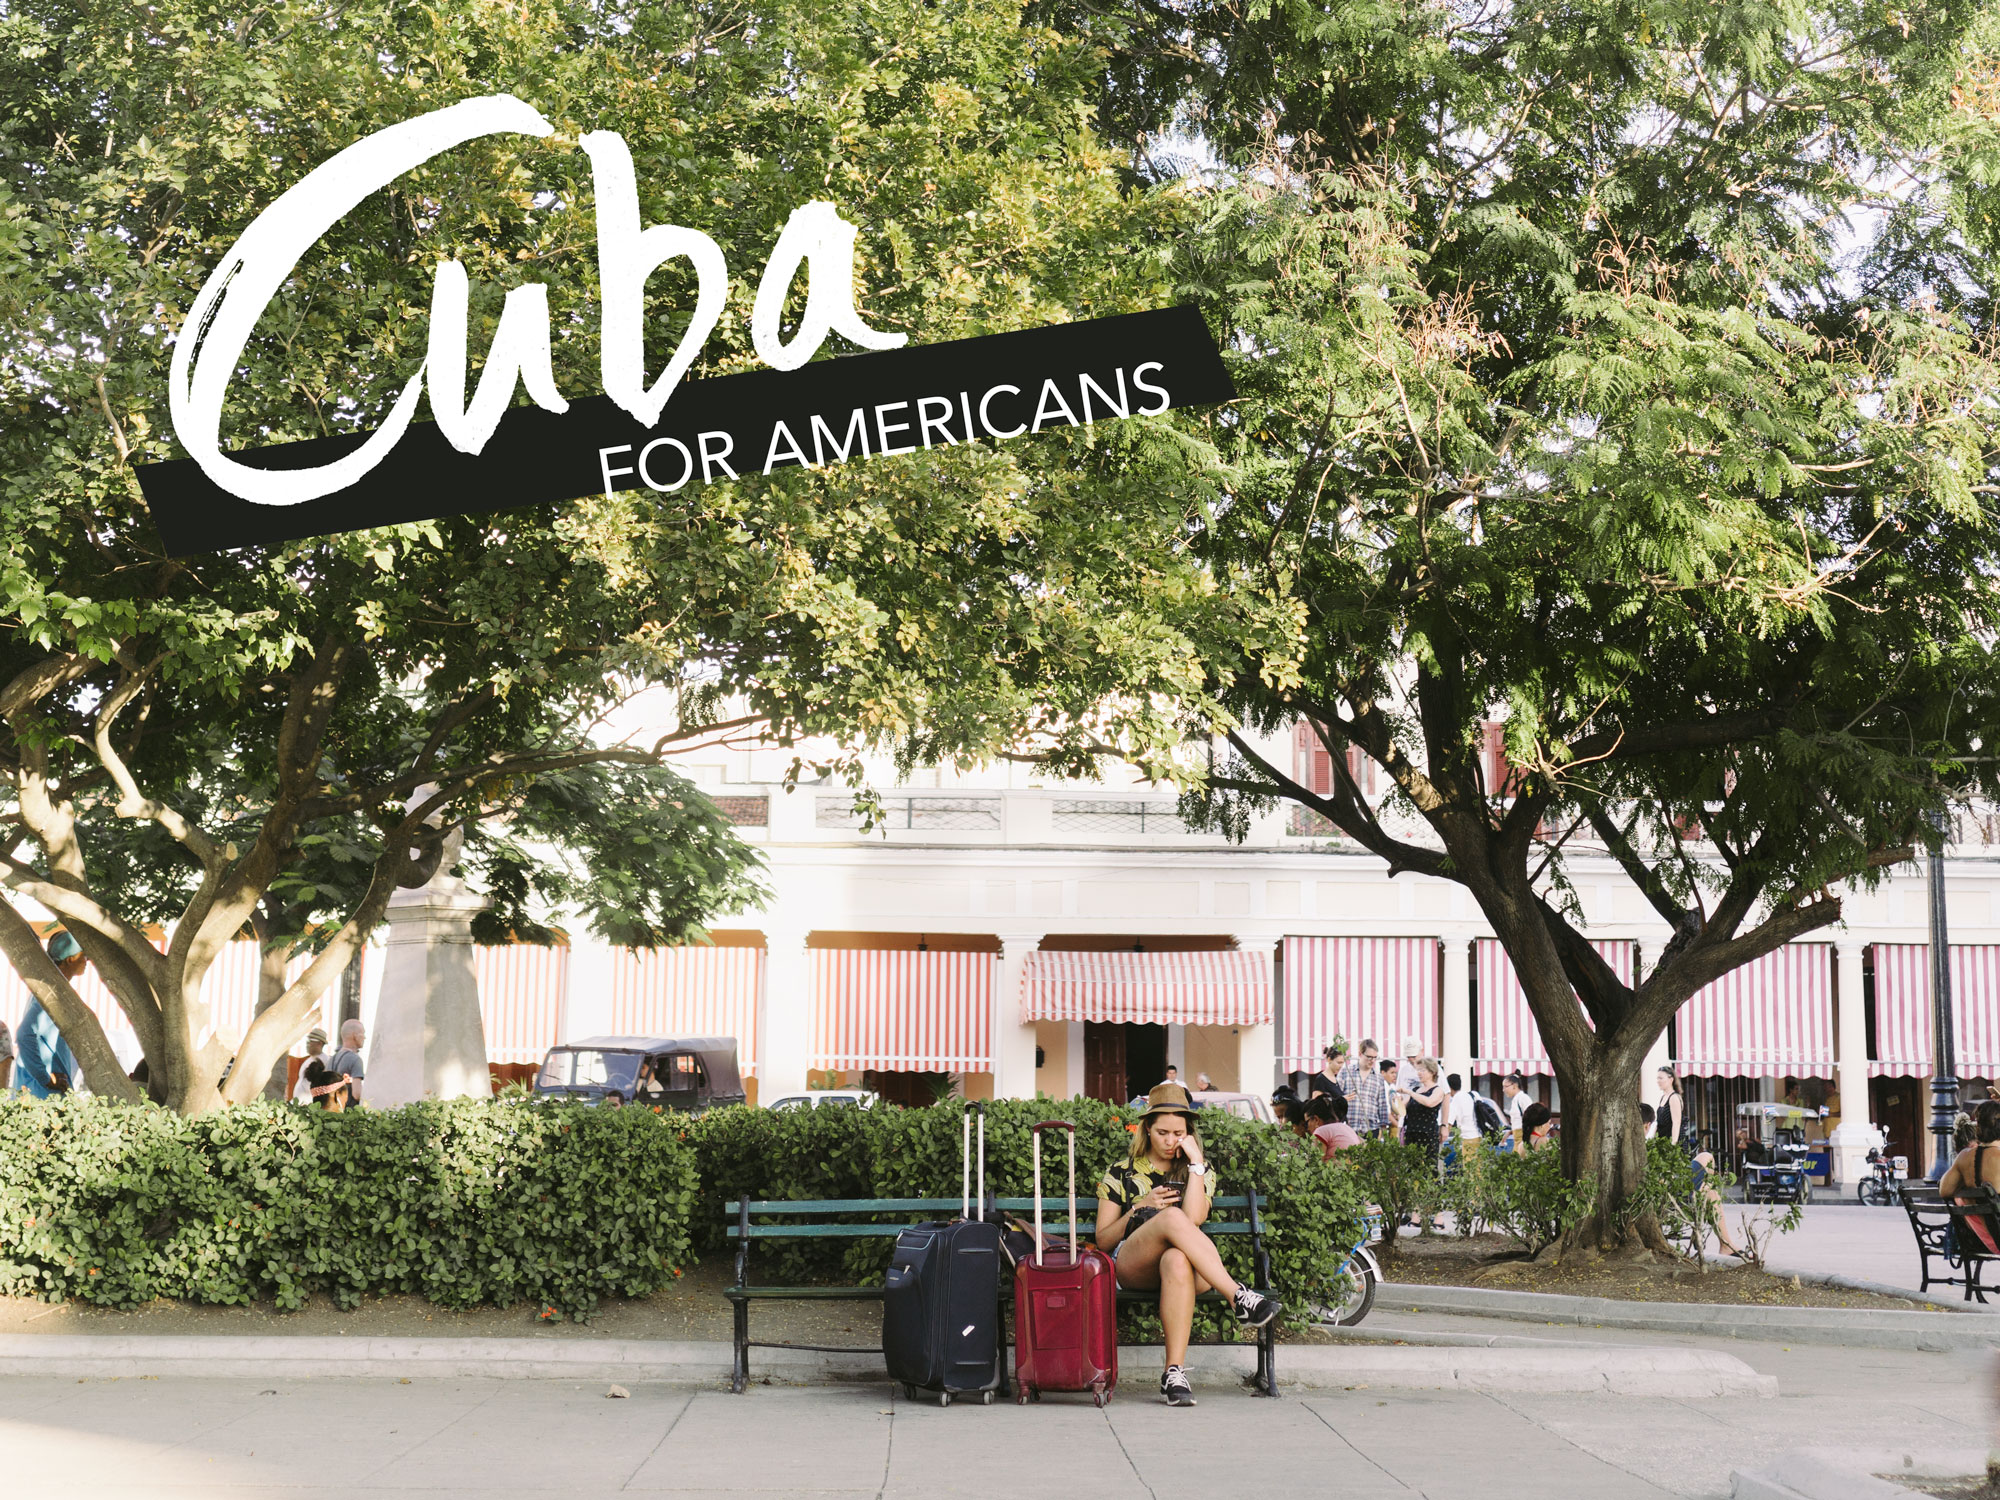 Cuba for Americans 2017